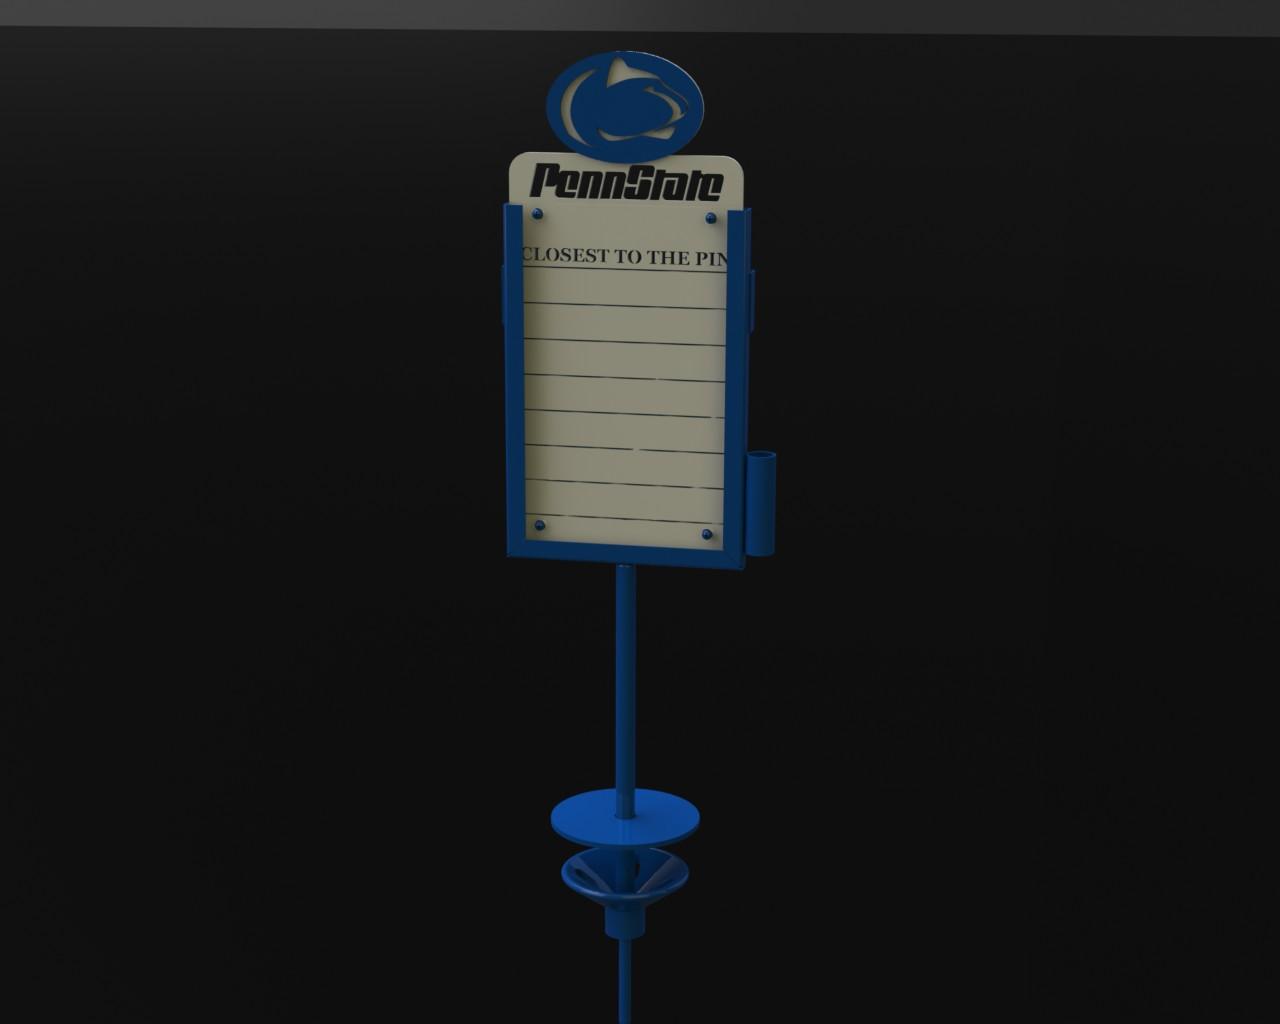 Penn State Proximity Marker